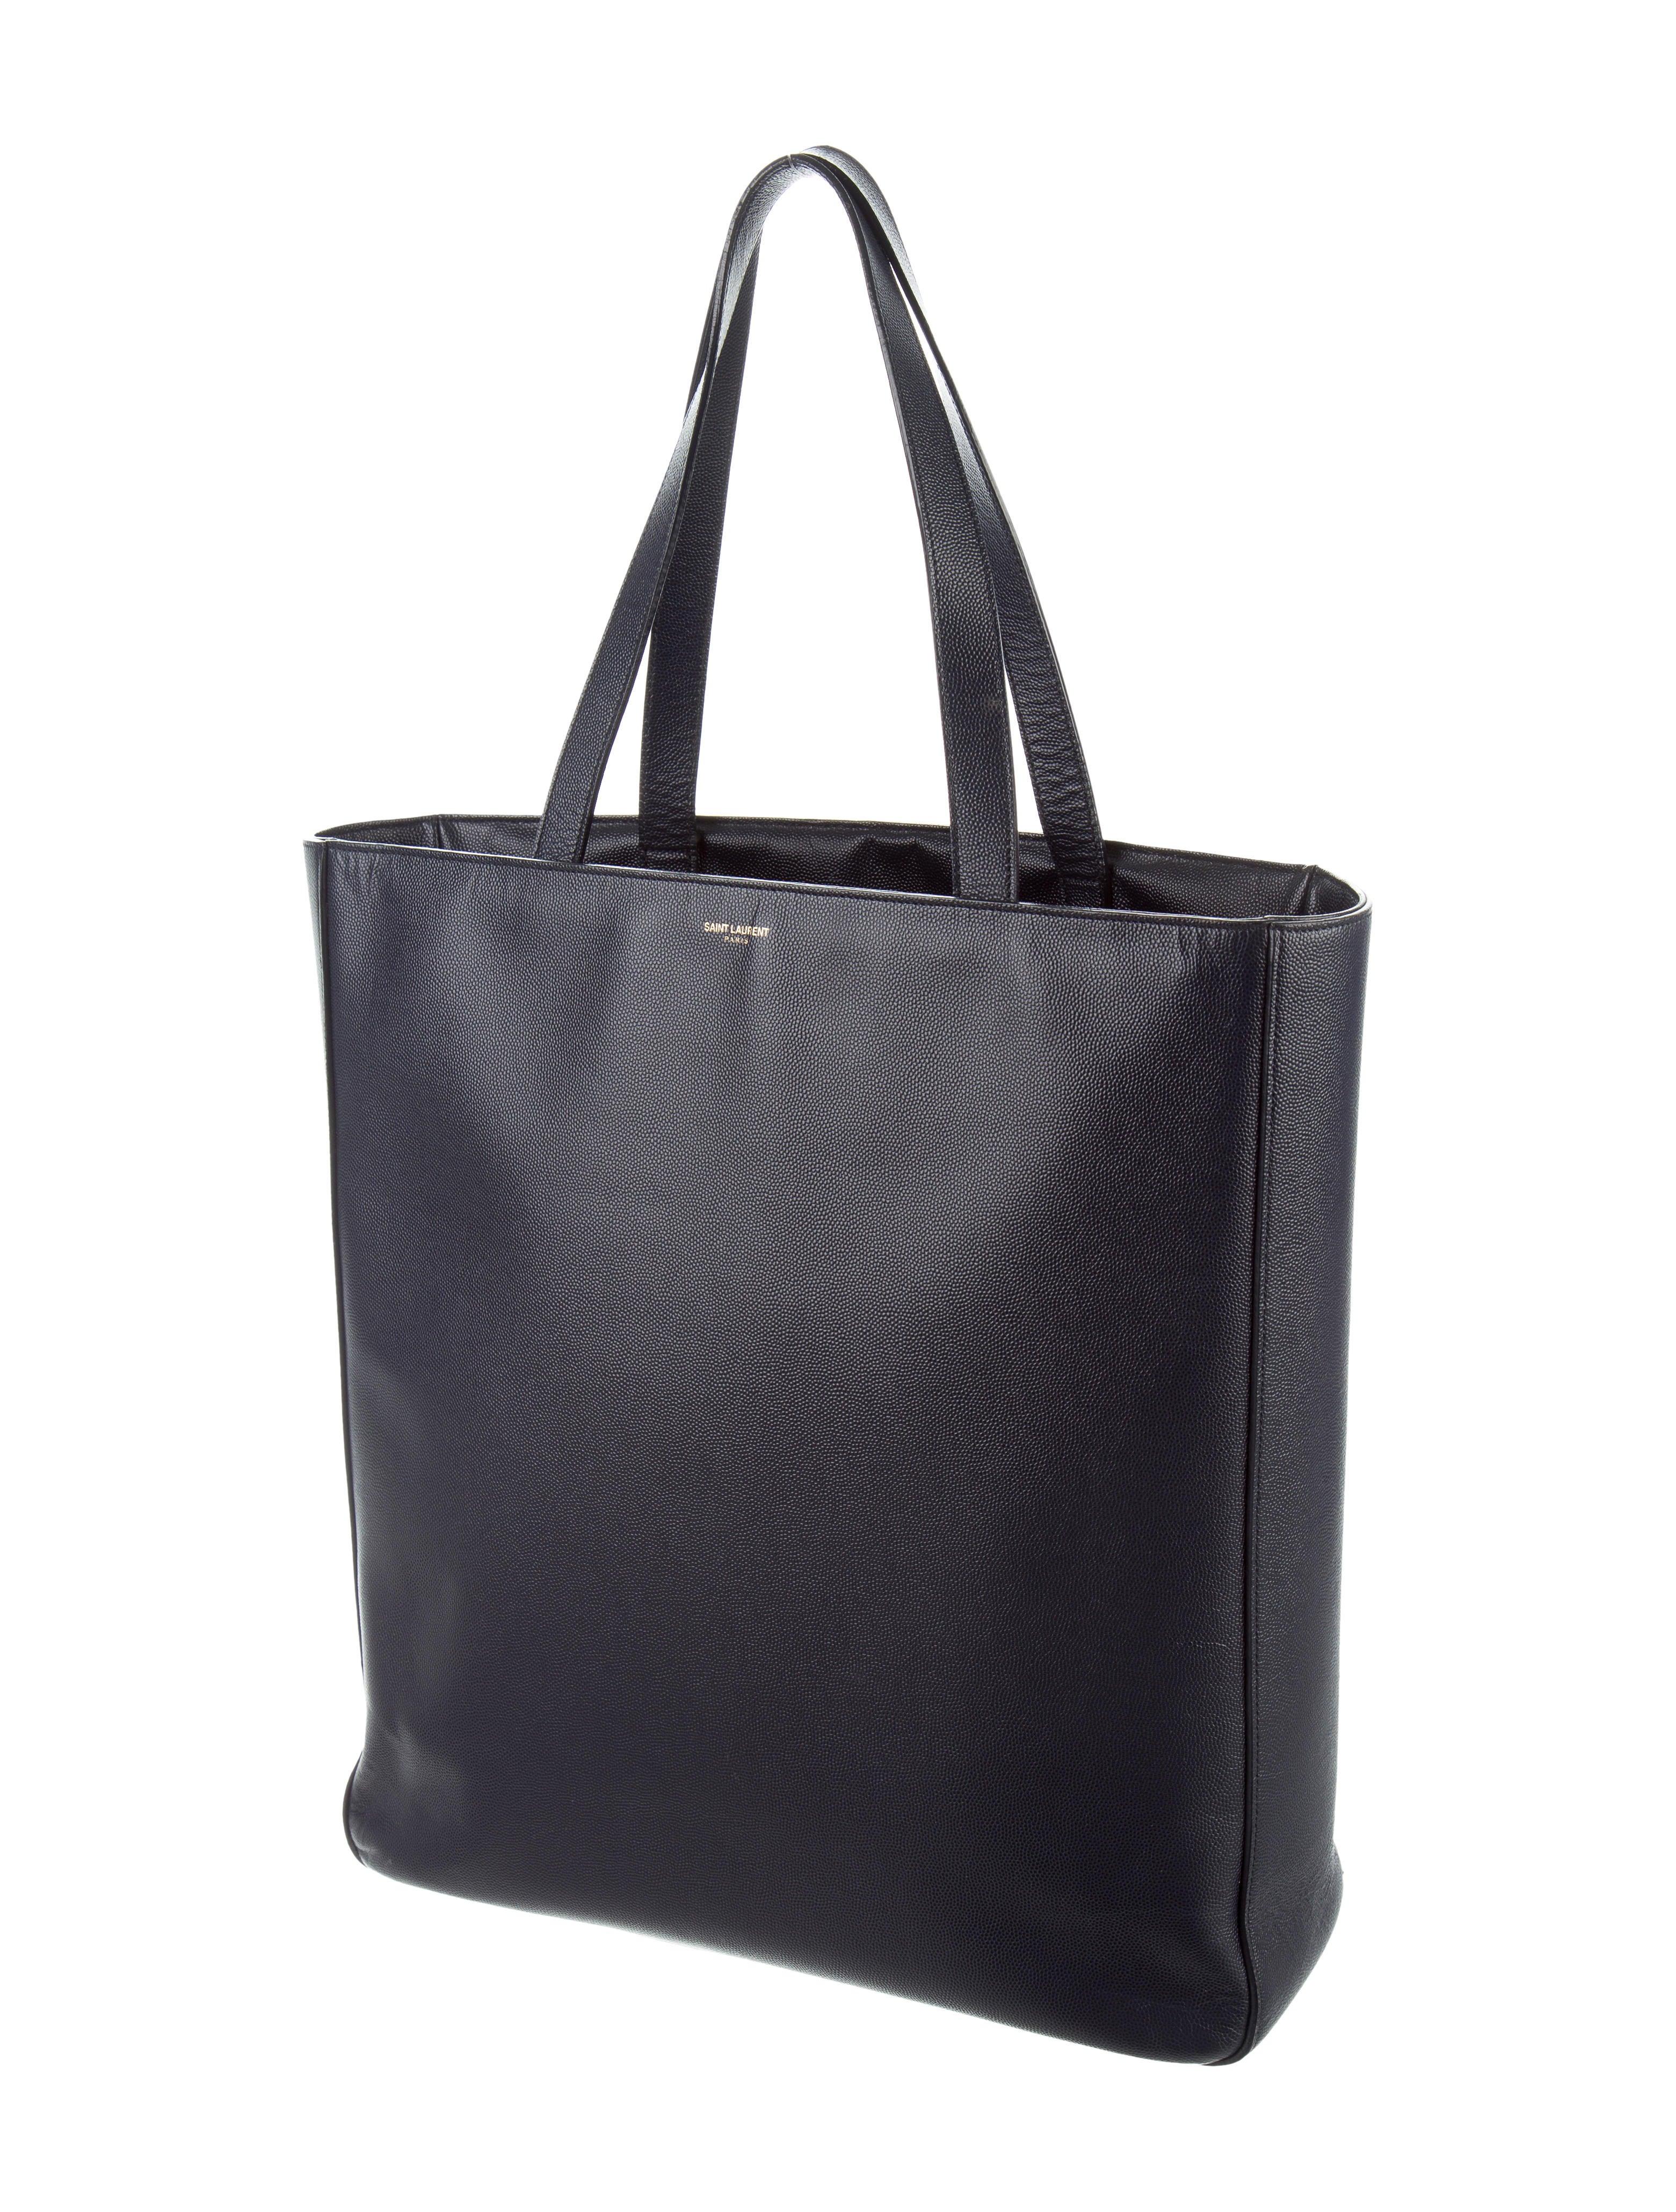 saint laurent leather shopper tote bags snt36959 the. Black Bedroom Furniture Sets. Home Design Ideas